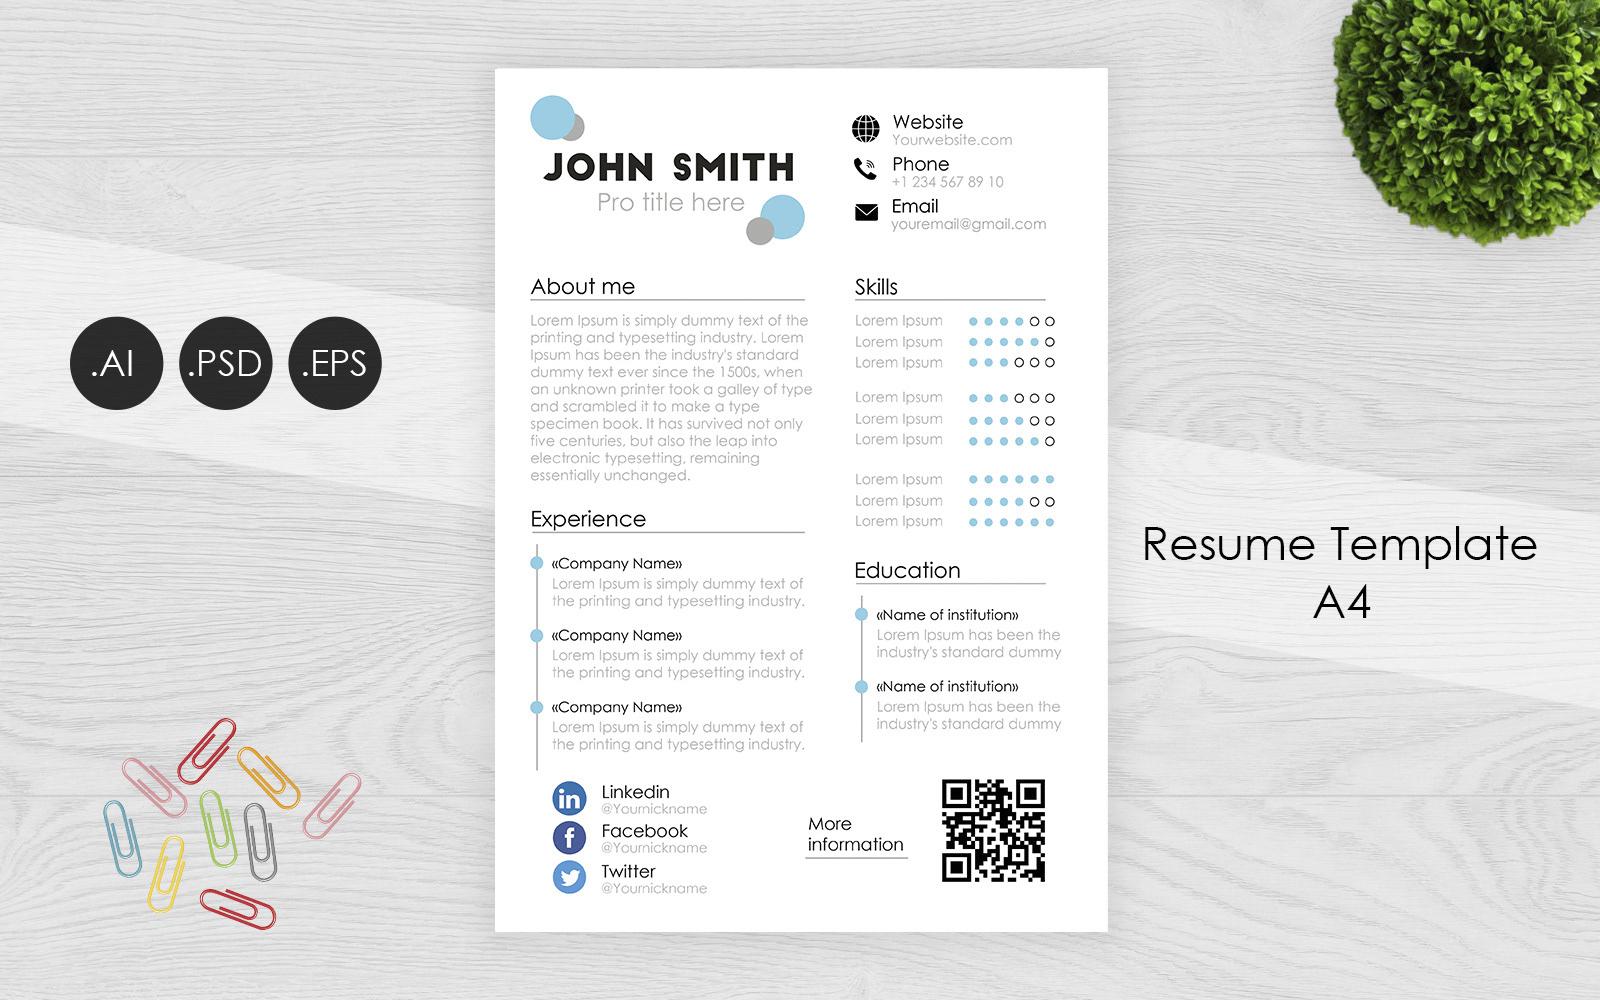 Professional AI / PSD / EPS Resume Template